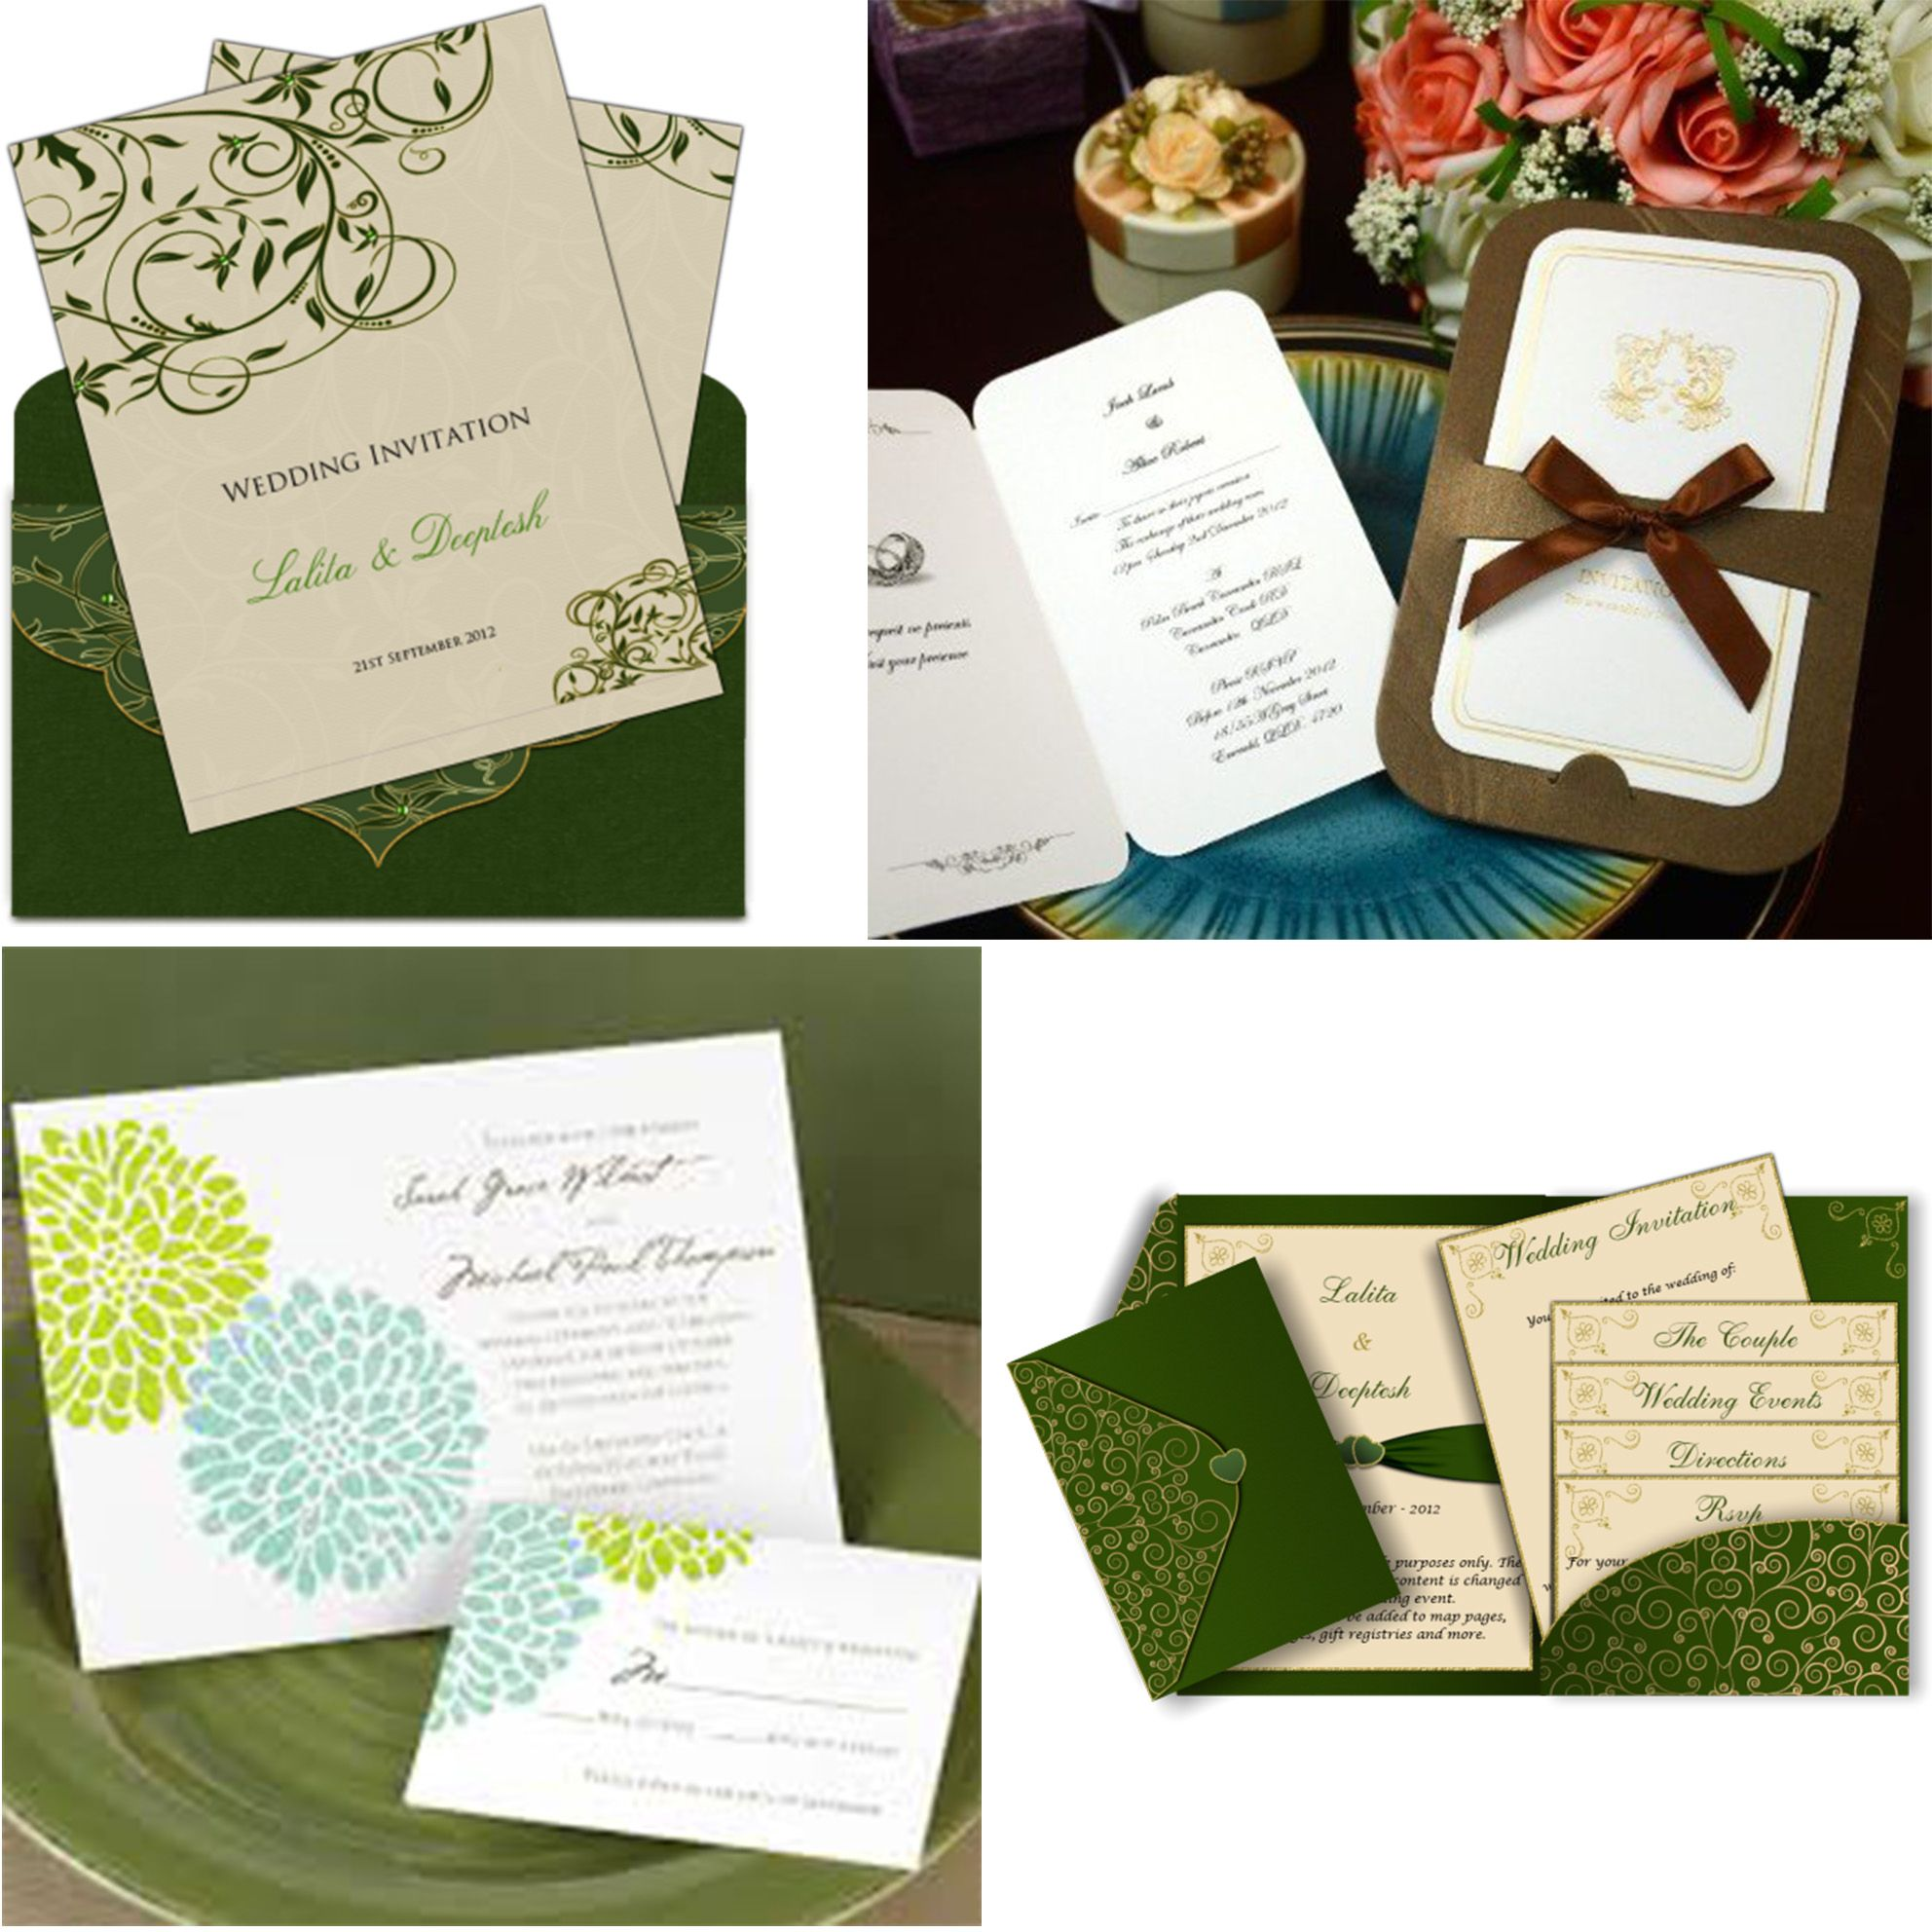 Earth Tone Wedding Invitations   themed wedding   Pinterest   Cheap ...